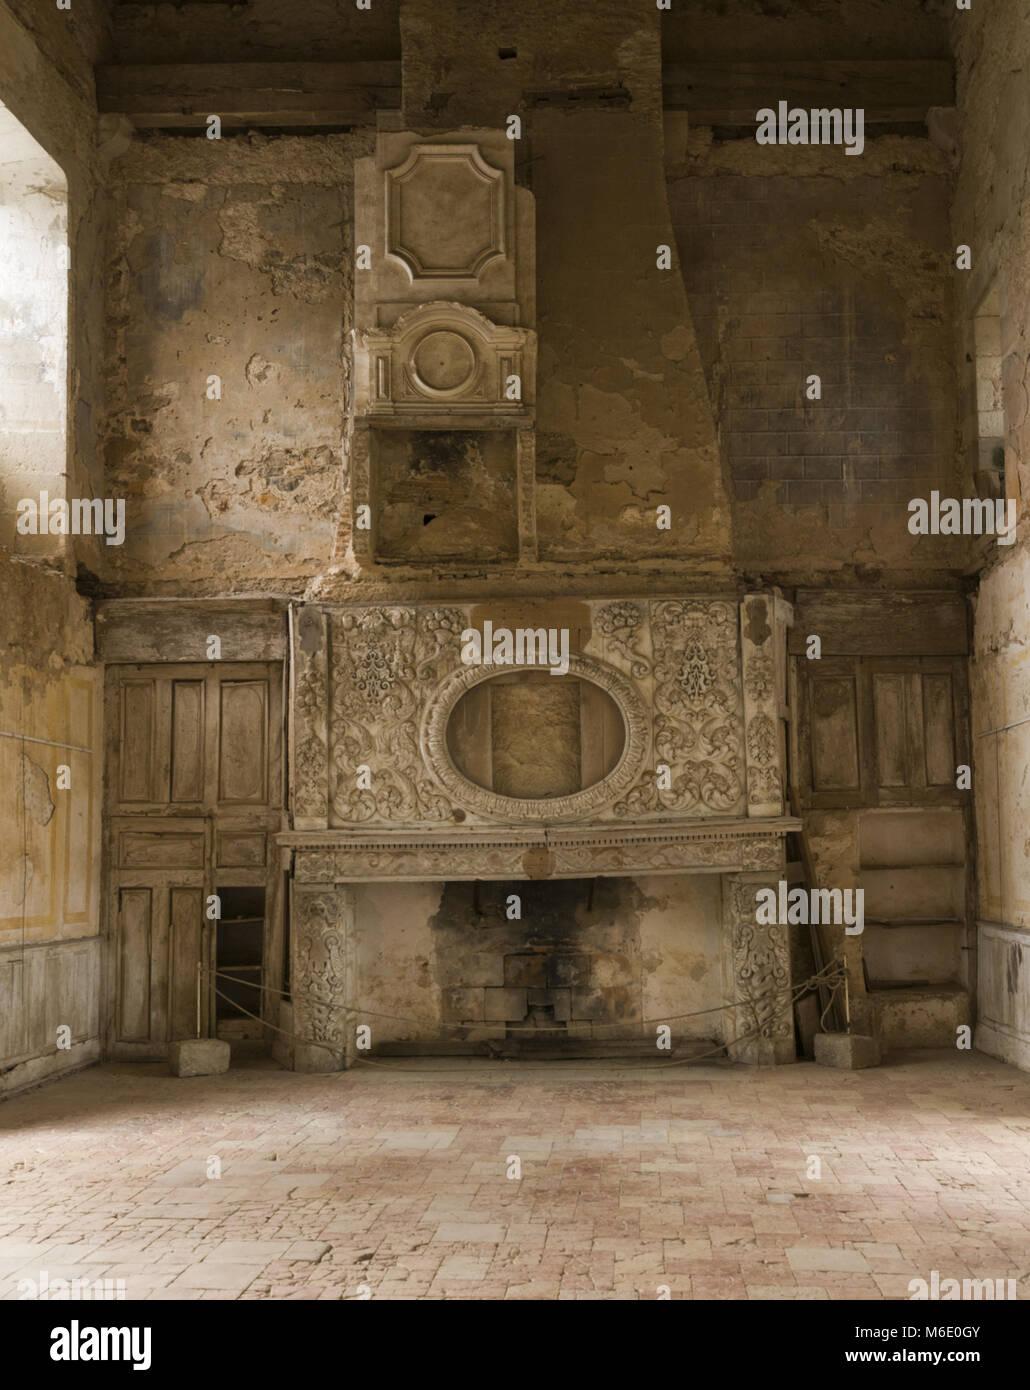 France, Tarn Et Garonne, Bruniquel, Old Chateau, 12th C, Interior Room